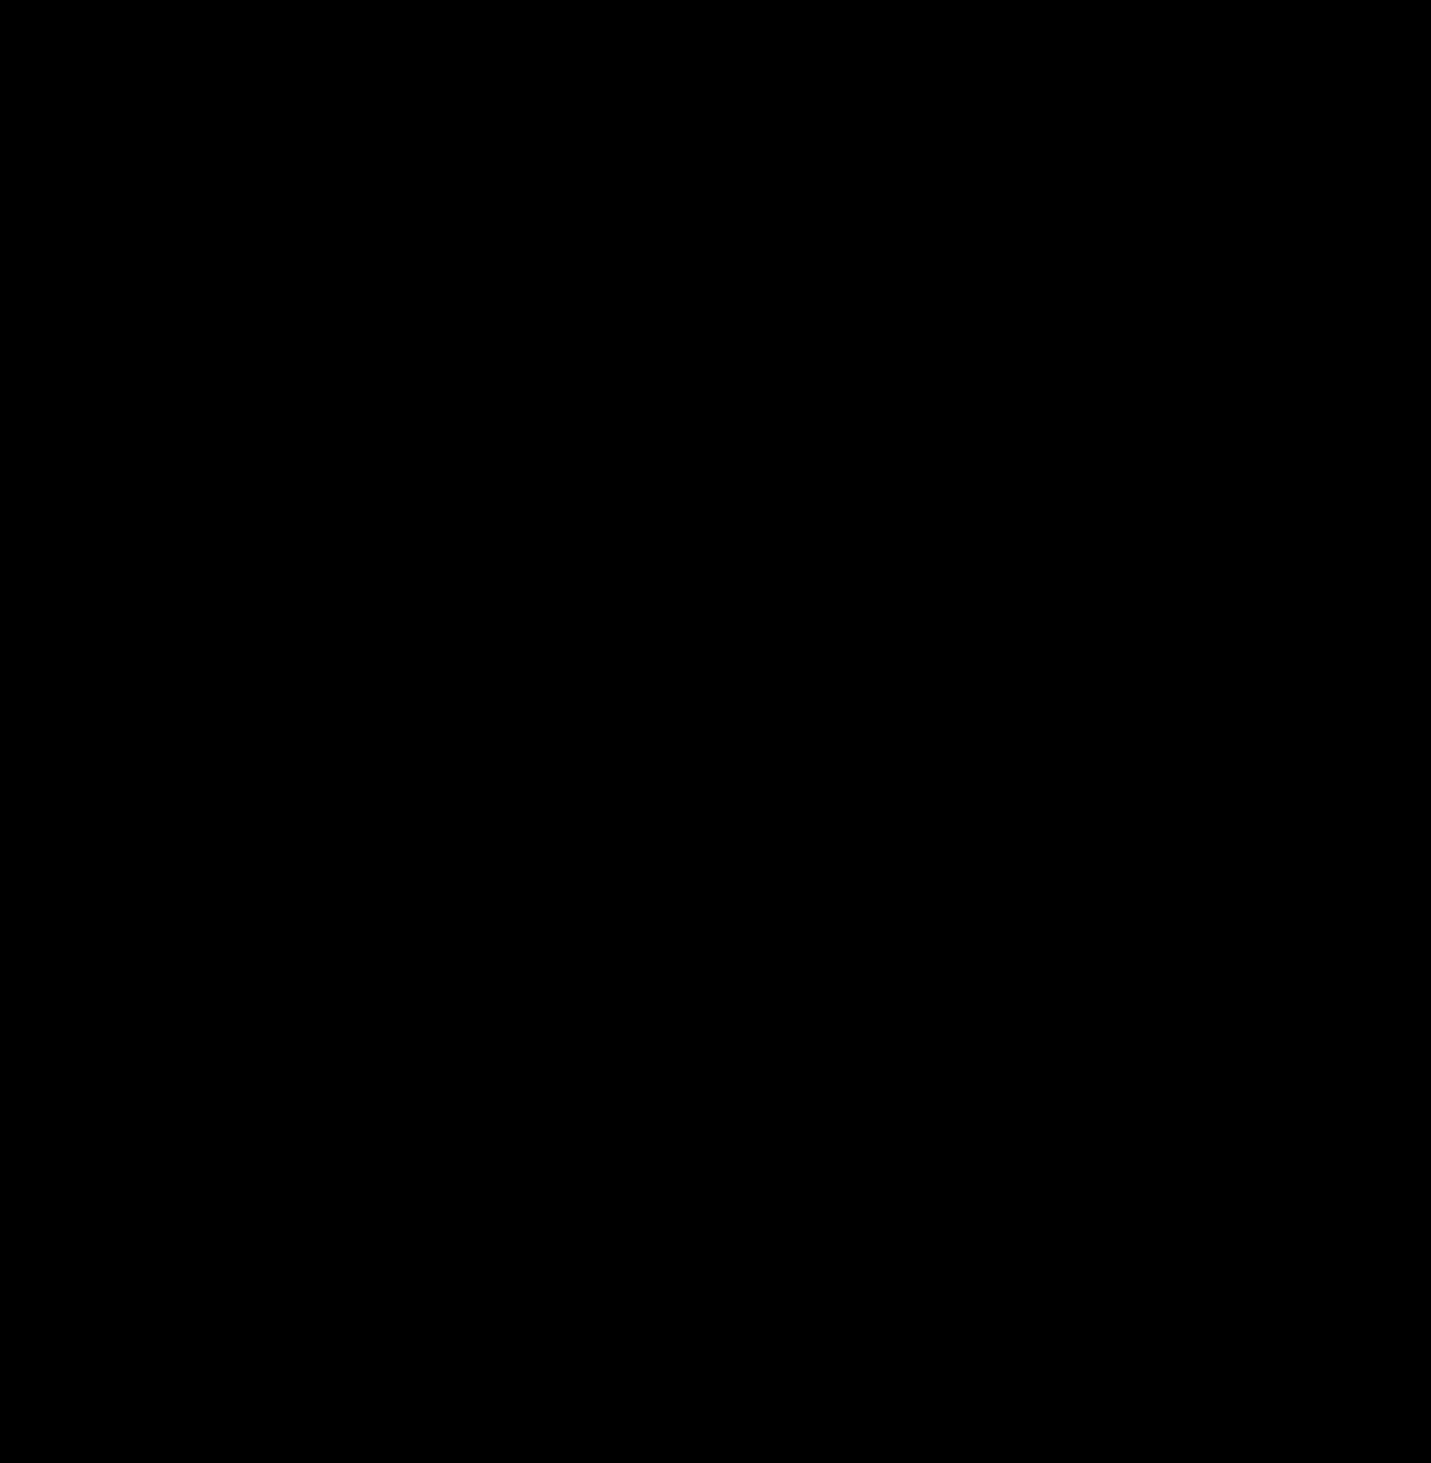 Prestige logo clipart graphic transparent download Daddy Yankee Prestige Logo Hot Girls Wallpaper Daddy - Clip ... graphic transparent download